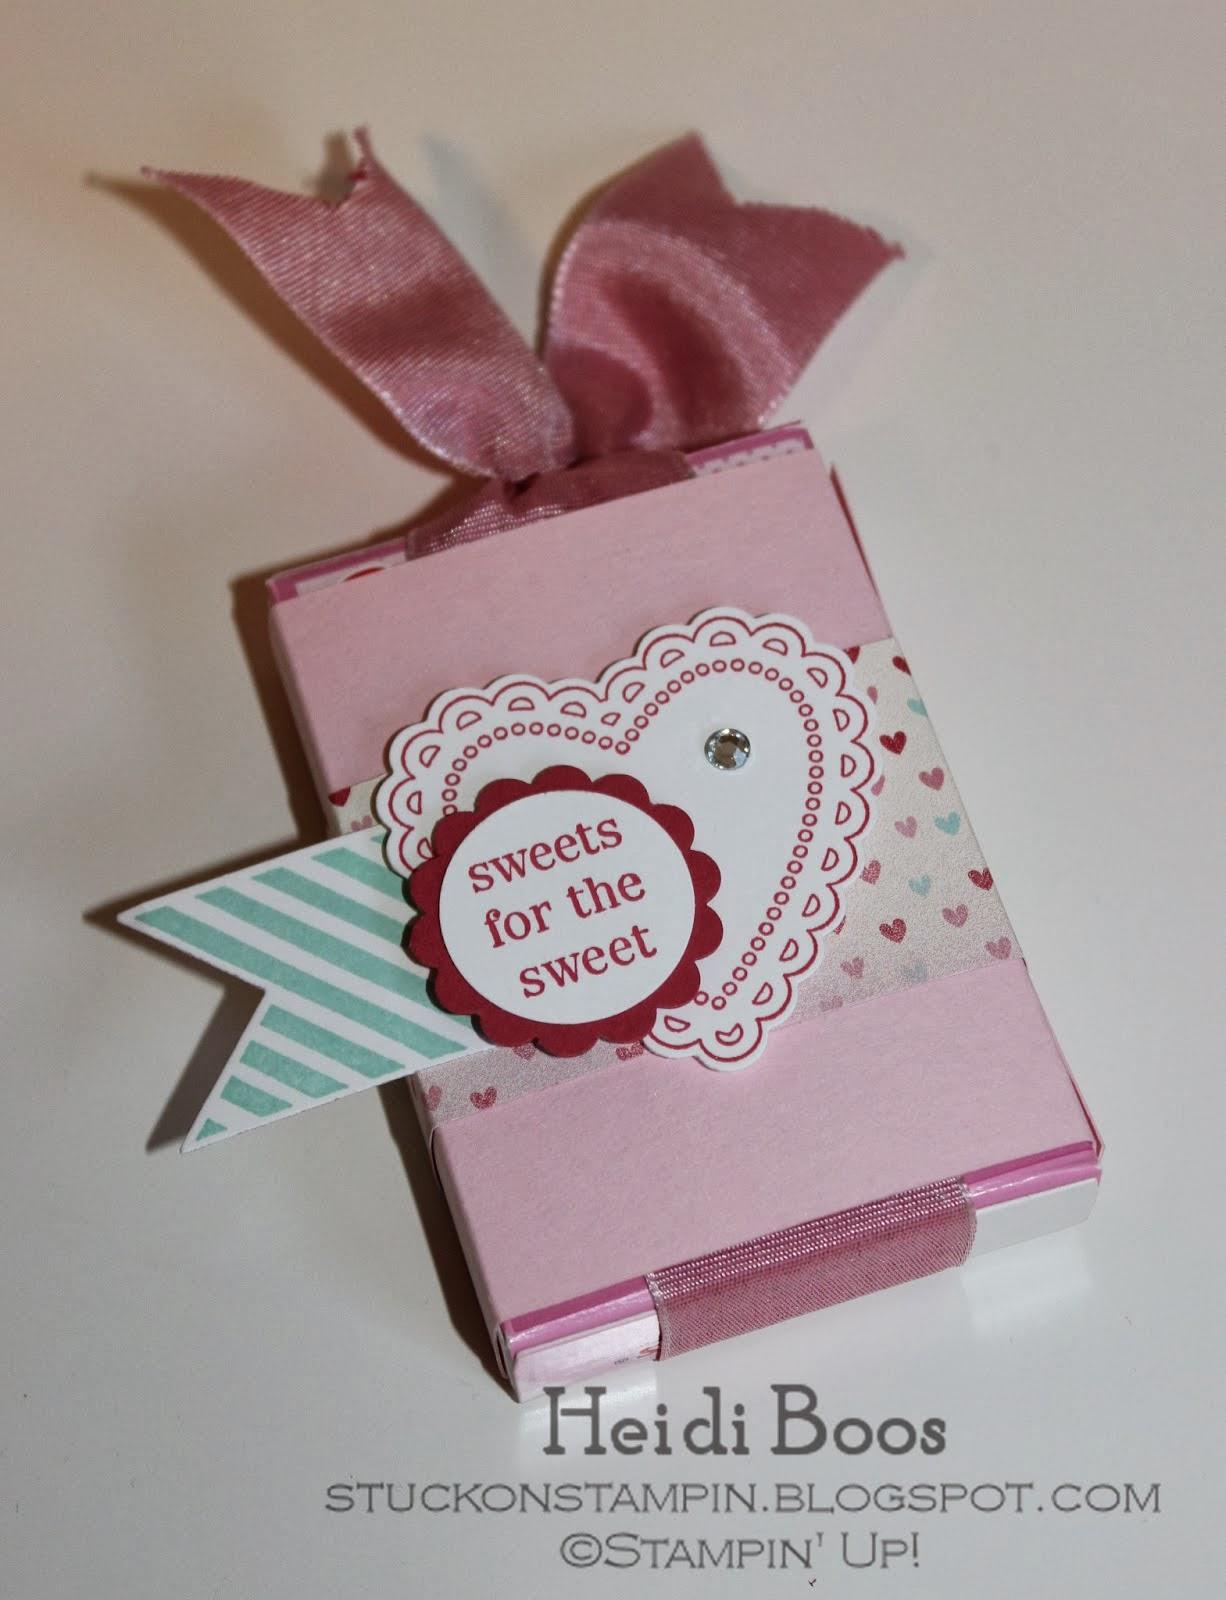 http://stuckonstampin.blogspot.com/2013/01/pull-up-sweethearts-candy-box-mini.html